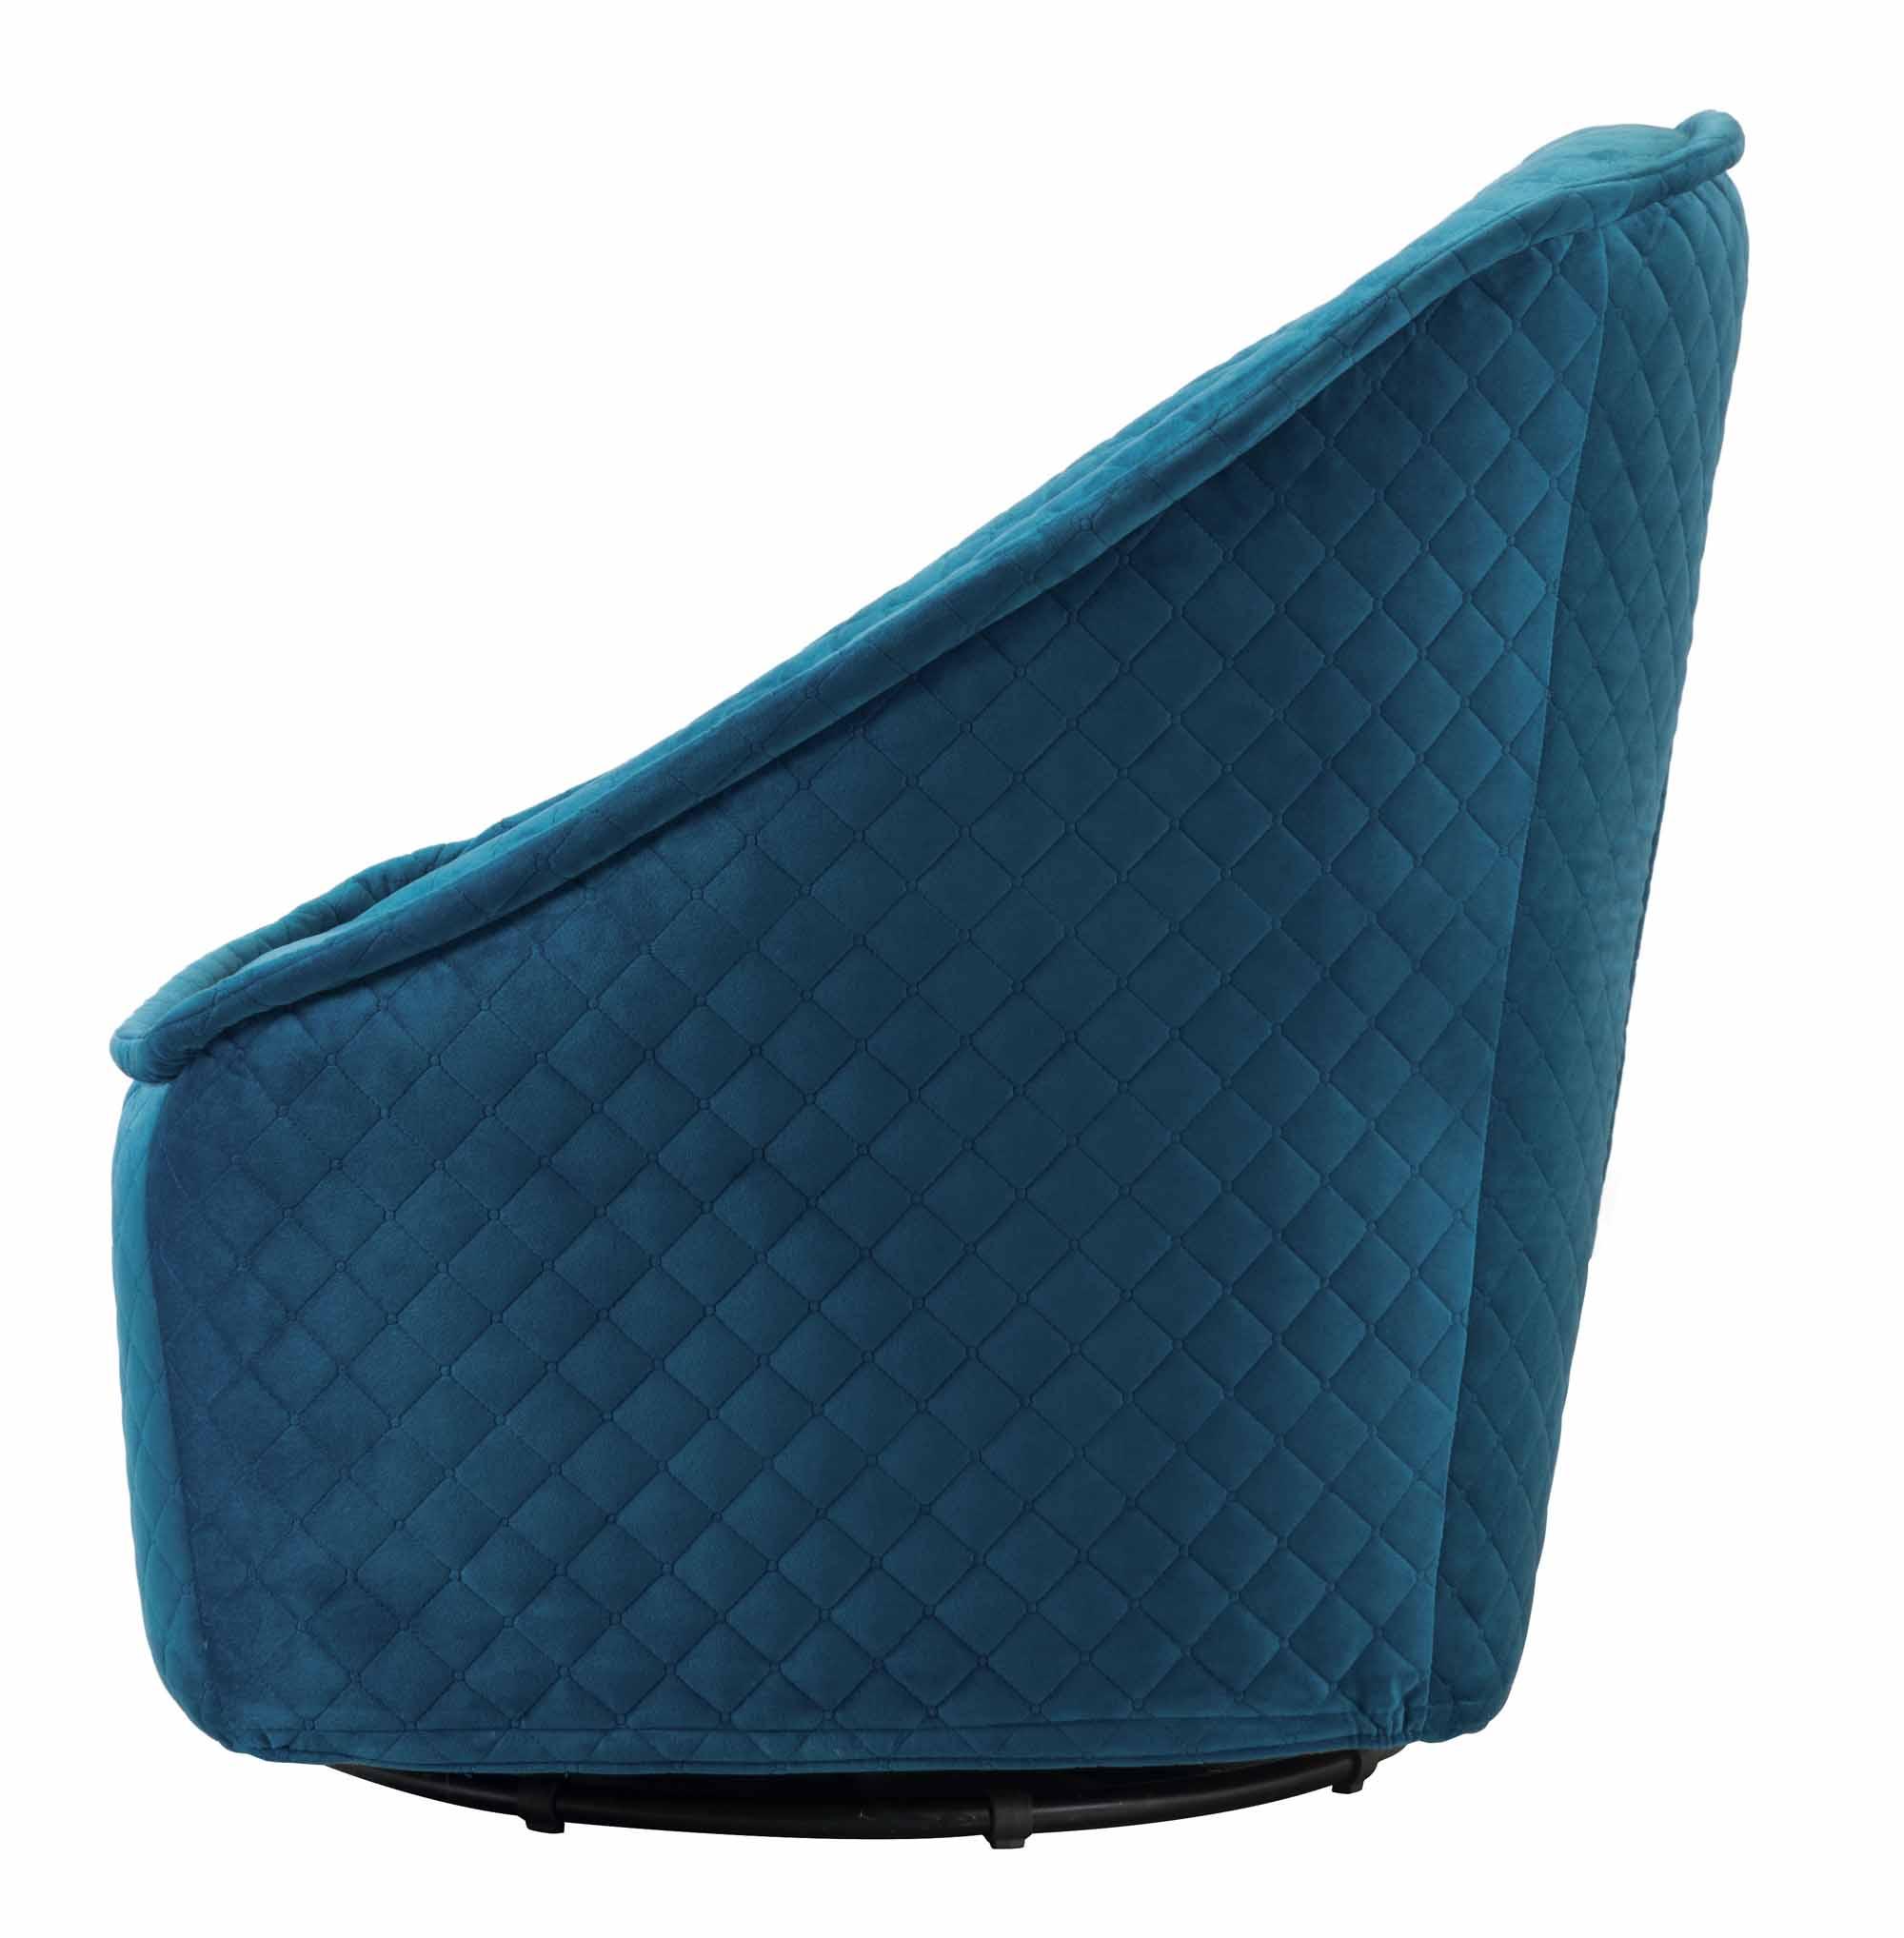 Amazing Pug Swivel Chair Aquamarine By Zuo Modern Evergreenethics Interior Chair Design Evergreenethicsorg